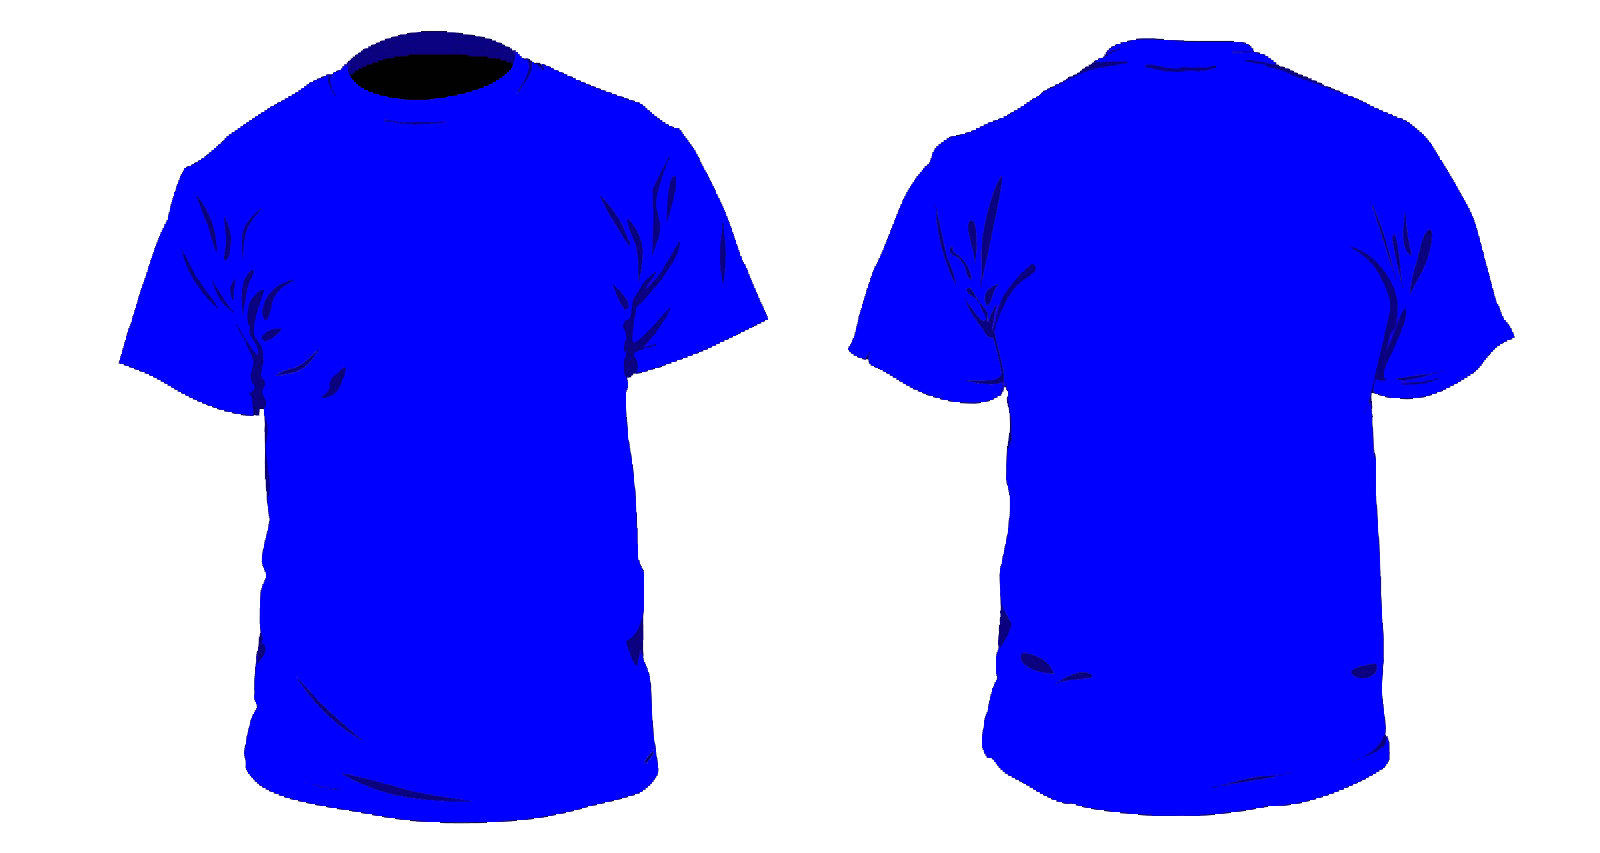 Desain Baju Kaos Polos